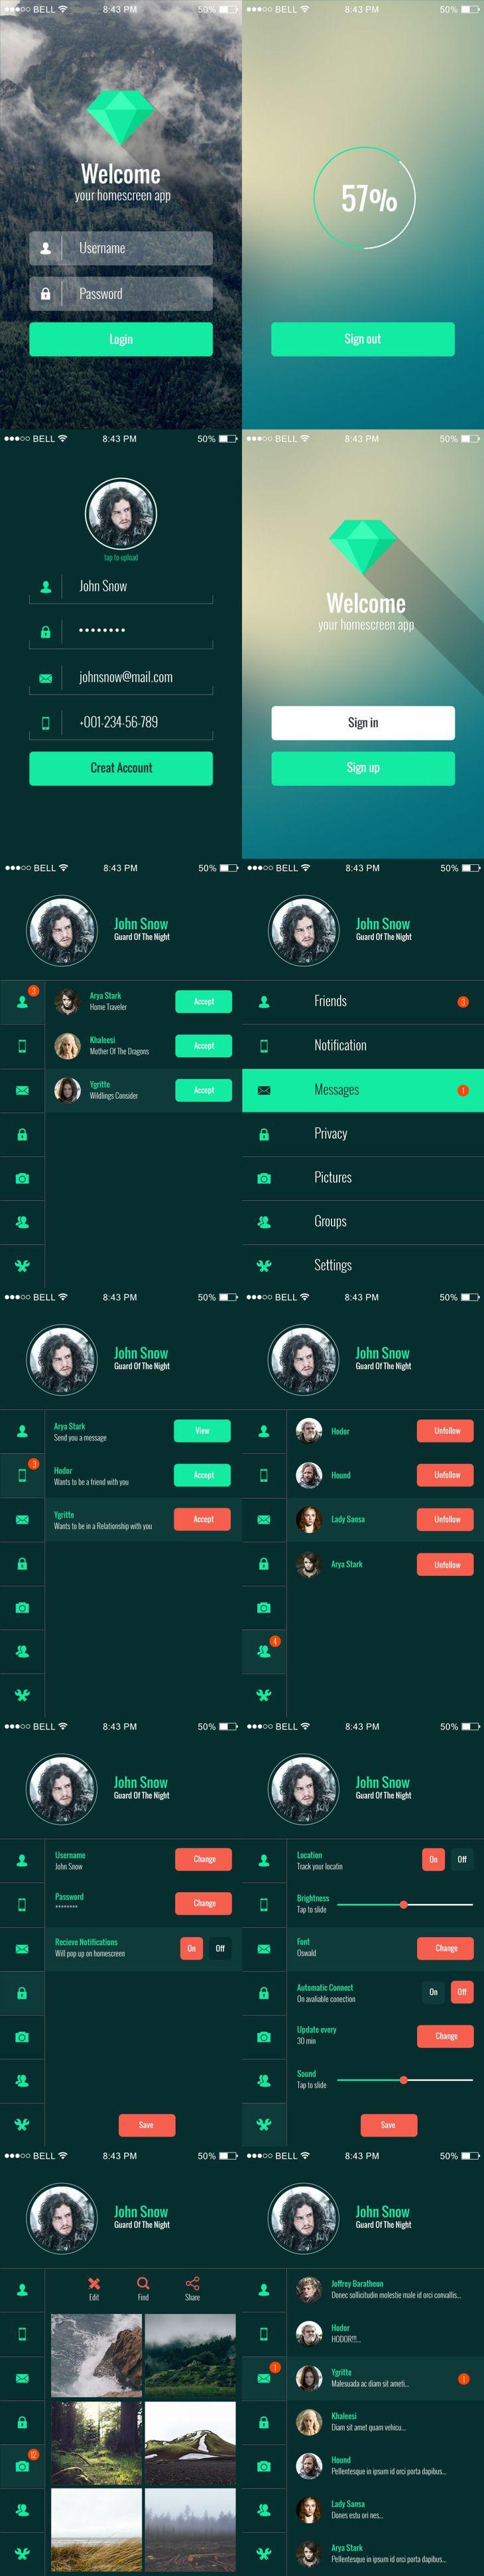 Mobile app ui kit preview